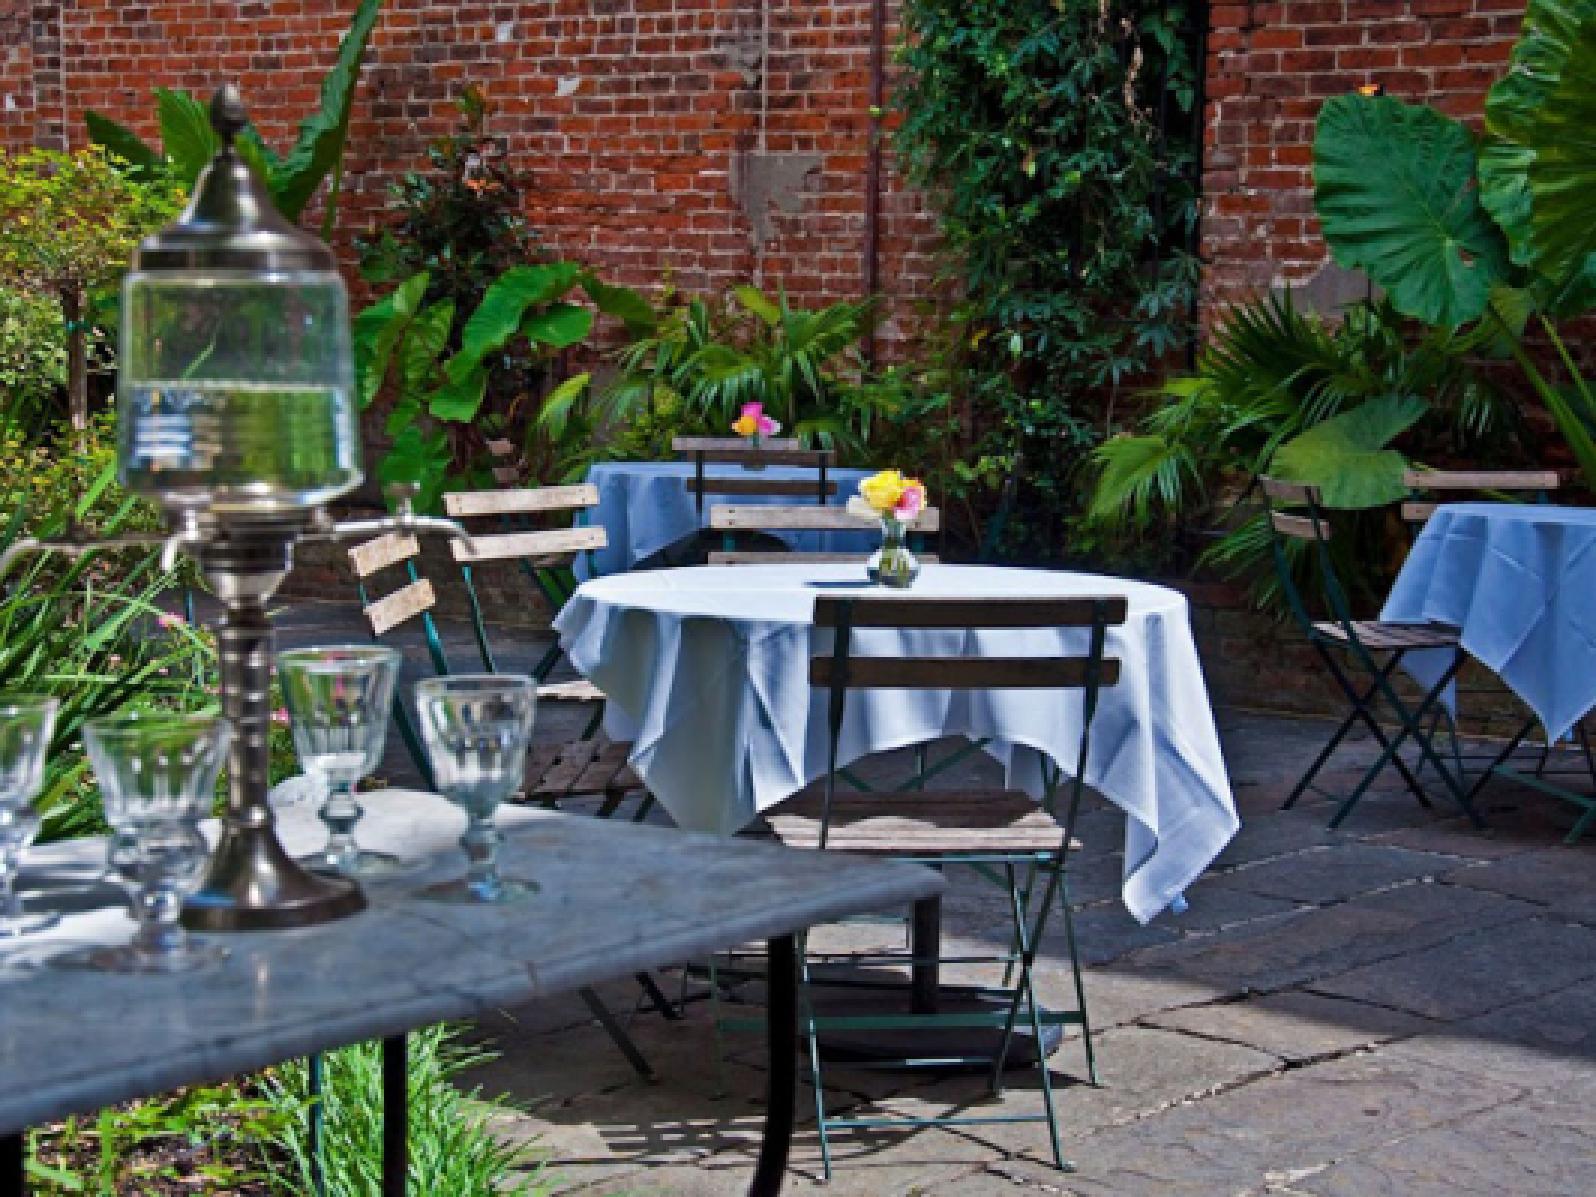 Outdoor dining area of Café Amelie near Andrew Jackson Hotel